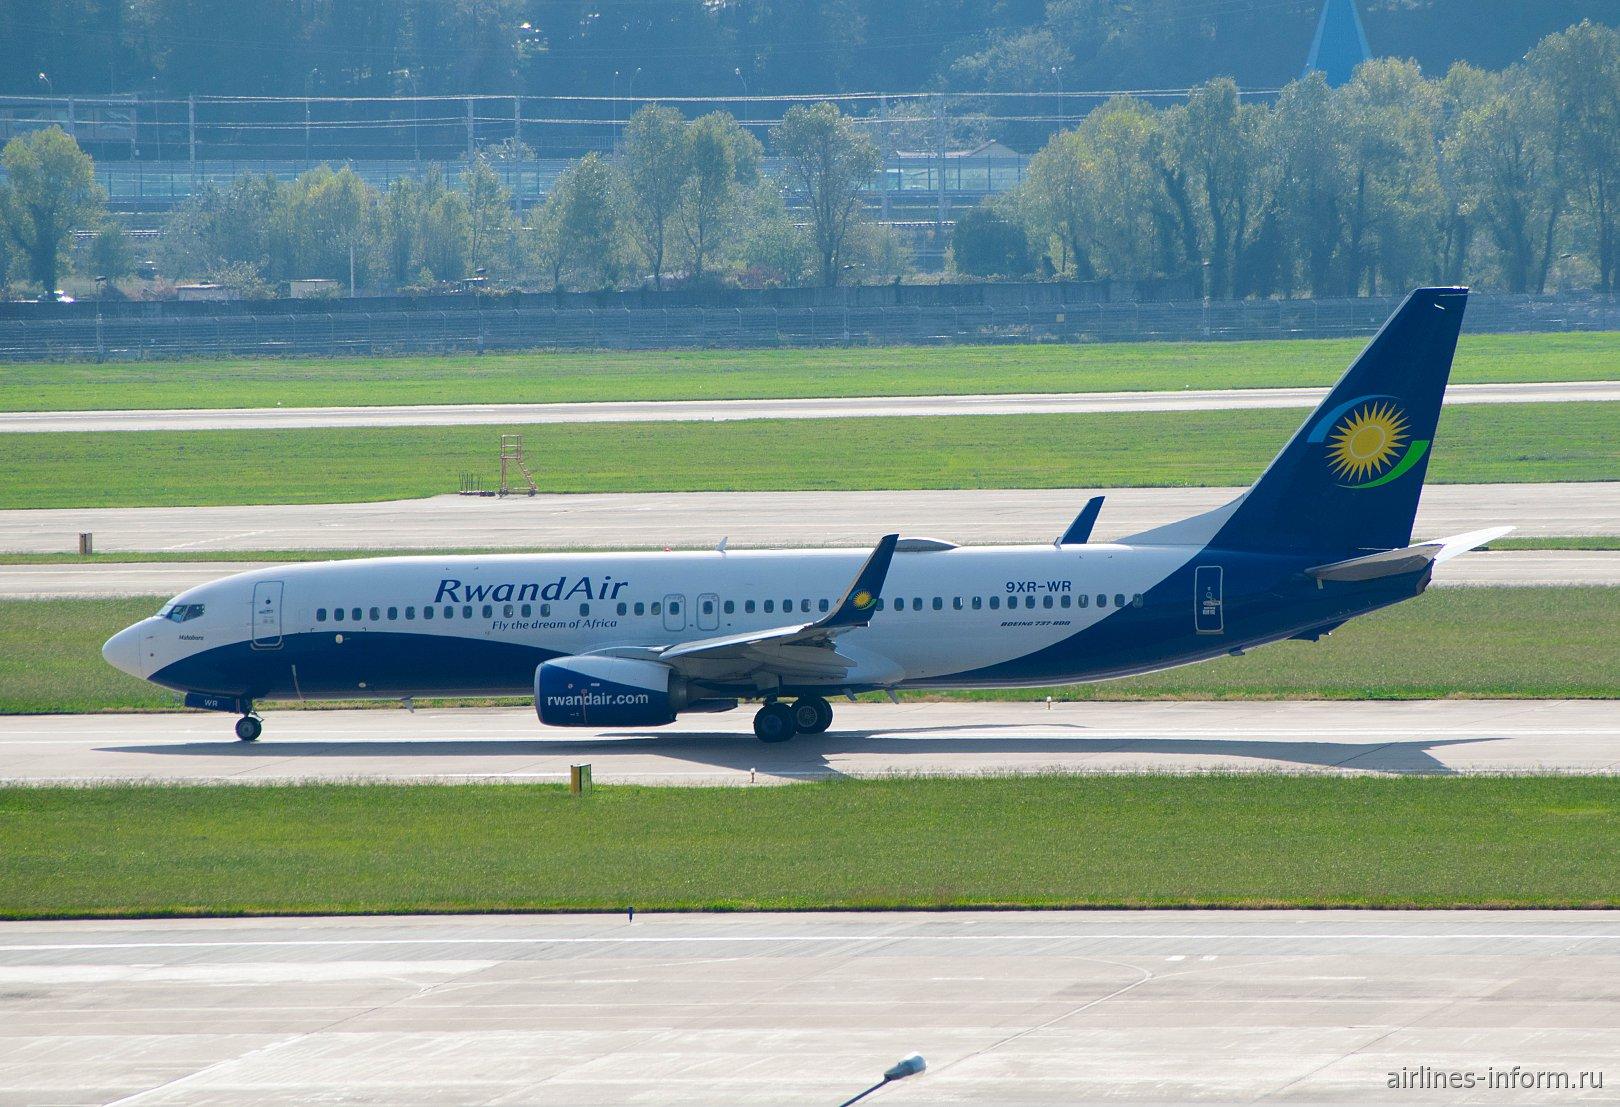 Боинг-737-800 9XR-WR авиакомпании RwandAir в аэропорту Сочи